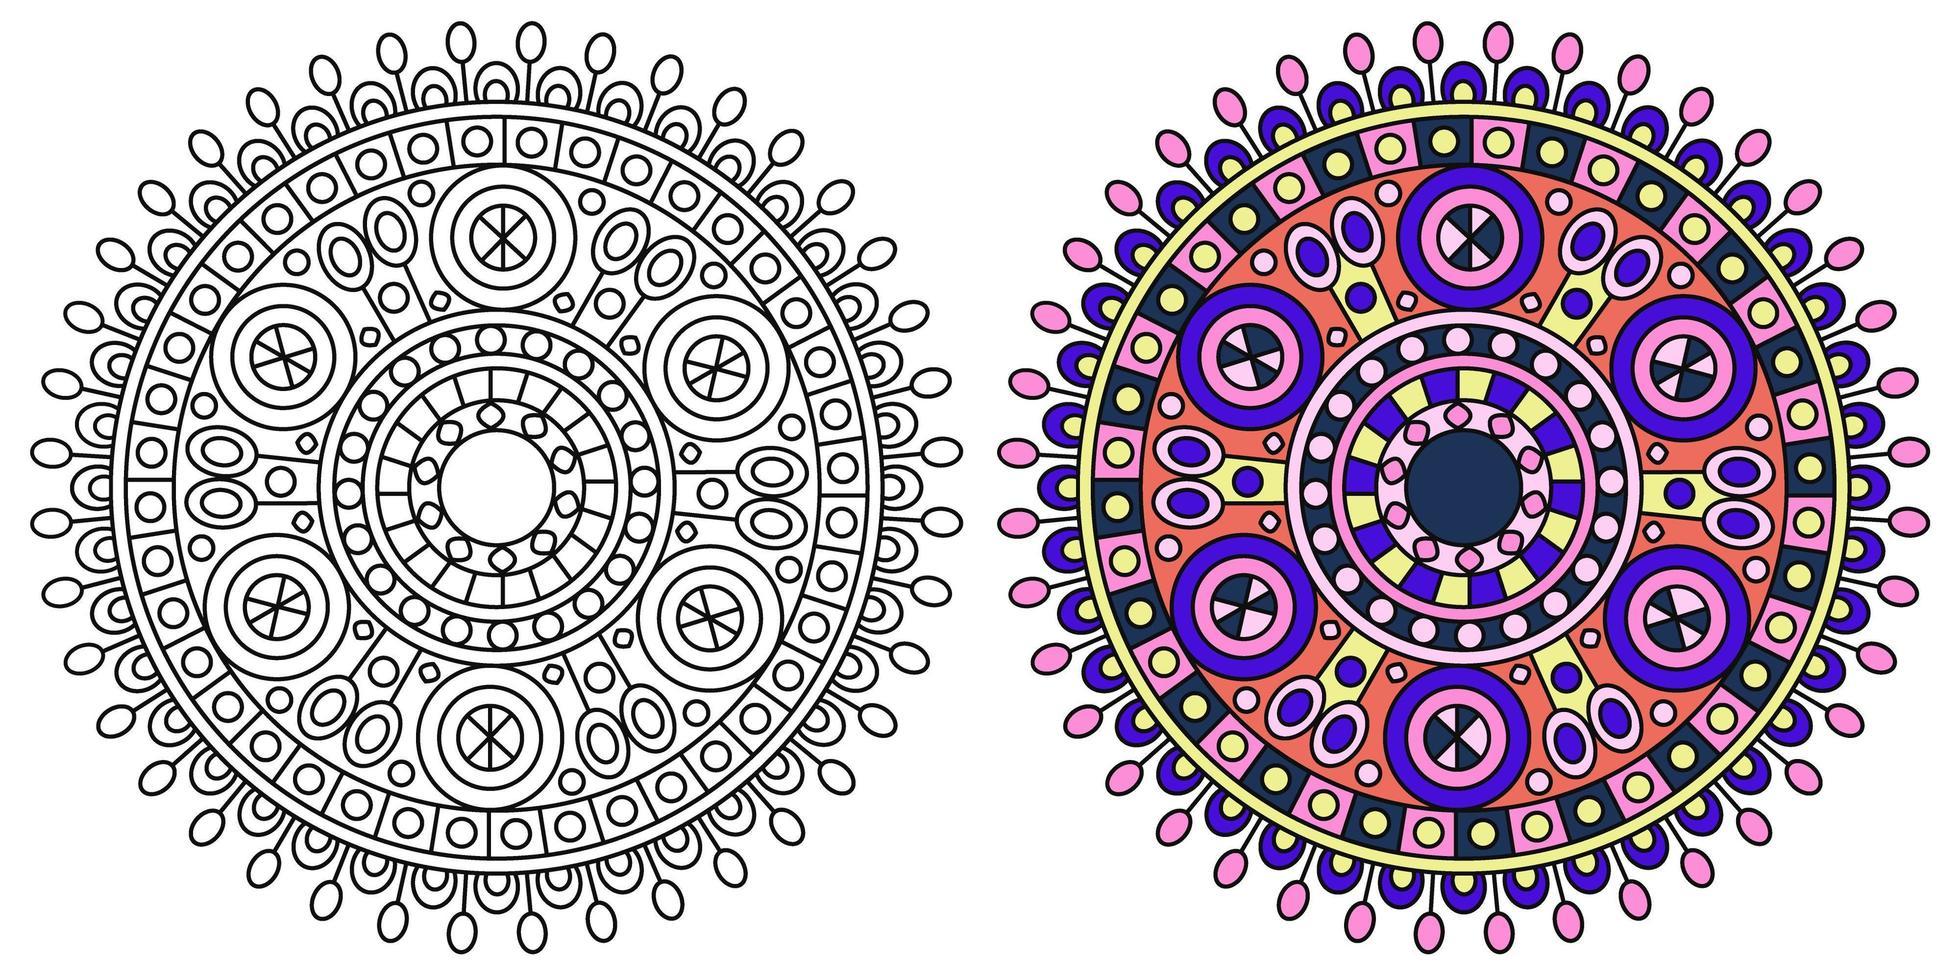 runde Mandala bunte Malvorlagen Vorlage vektor